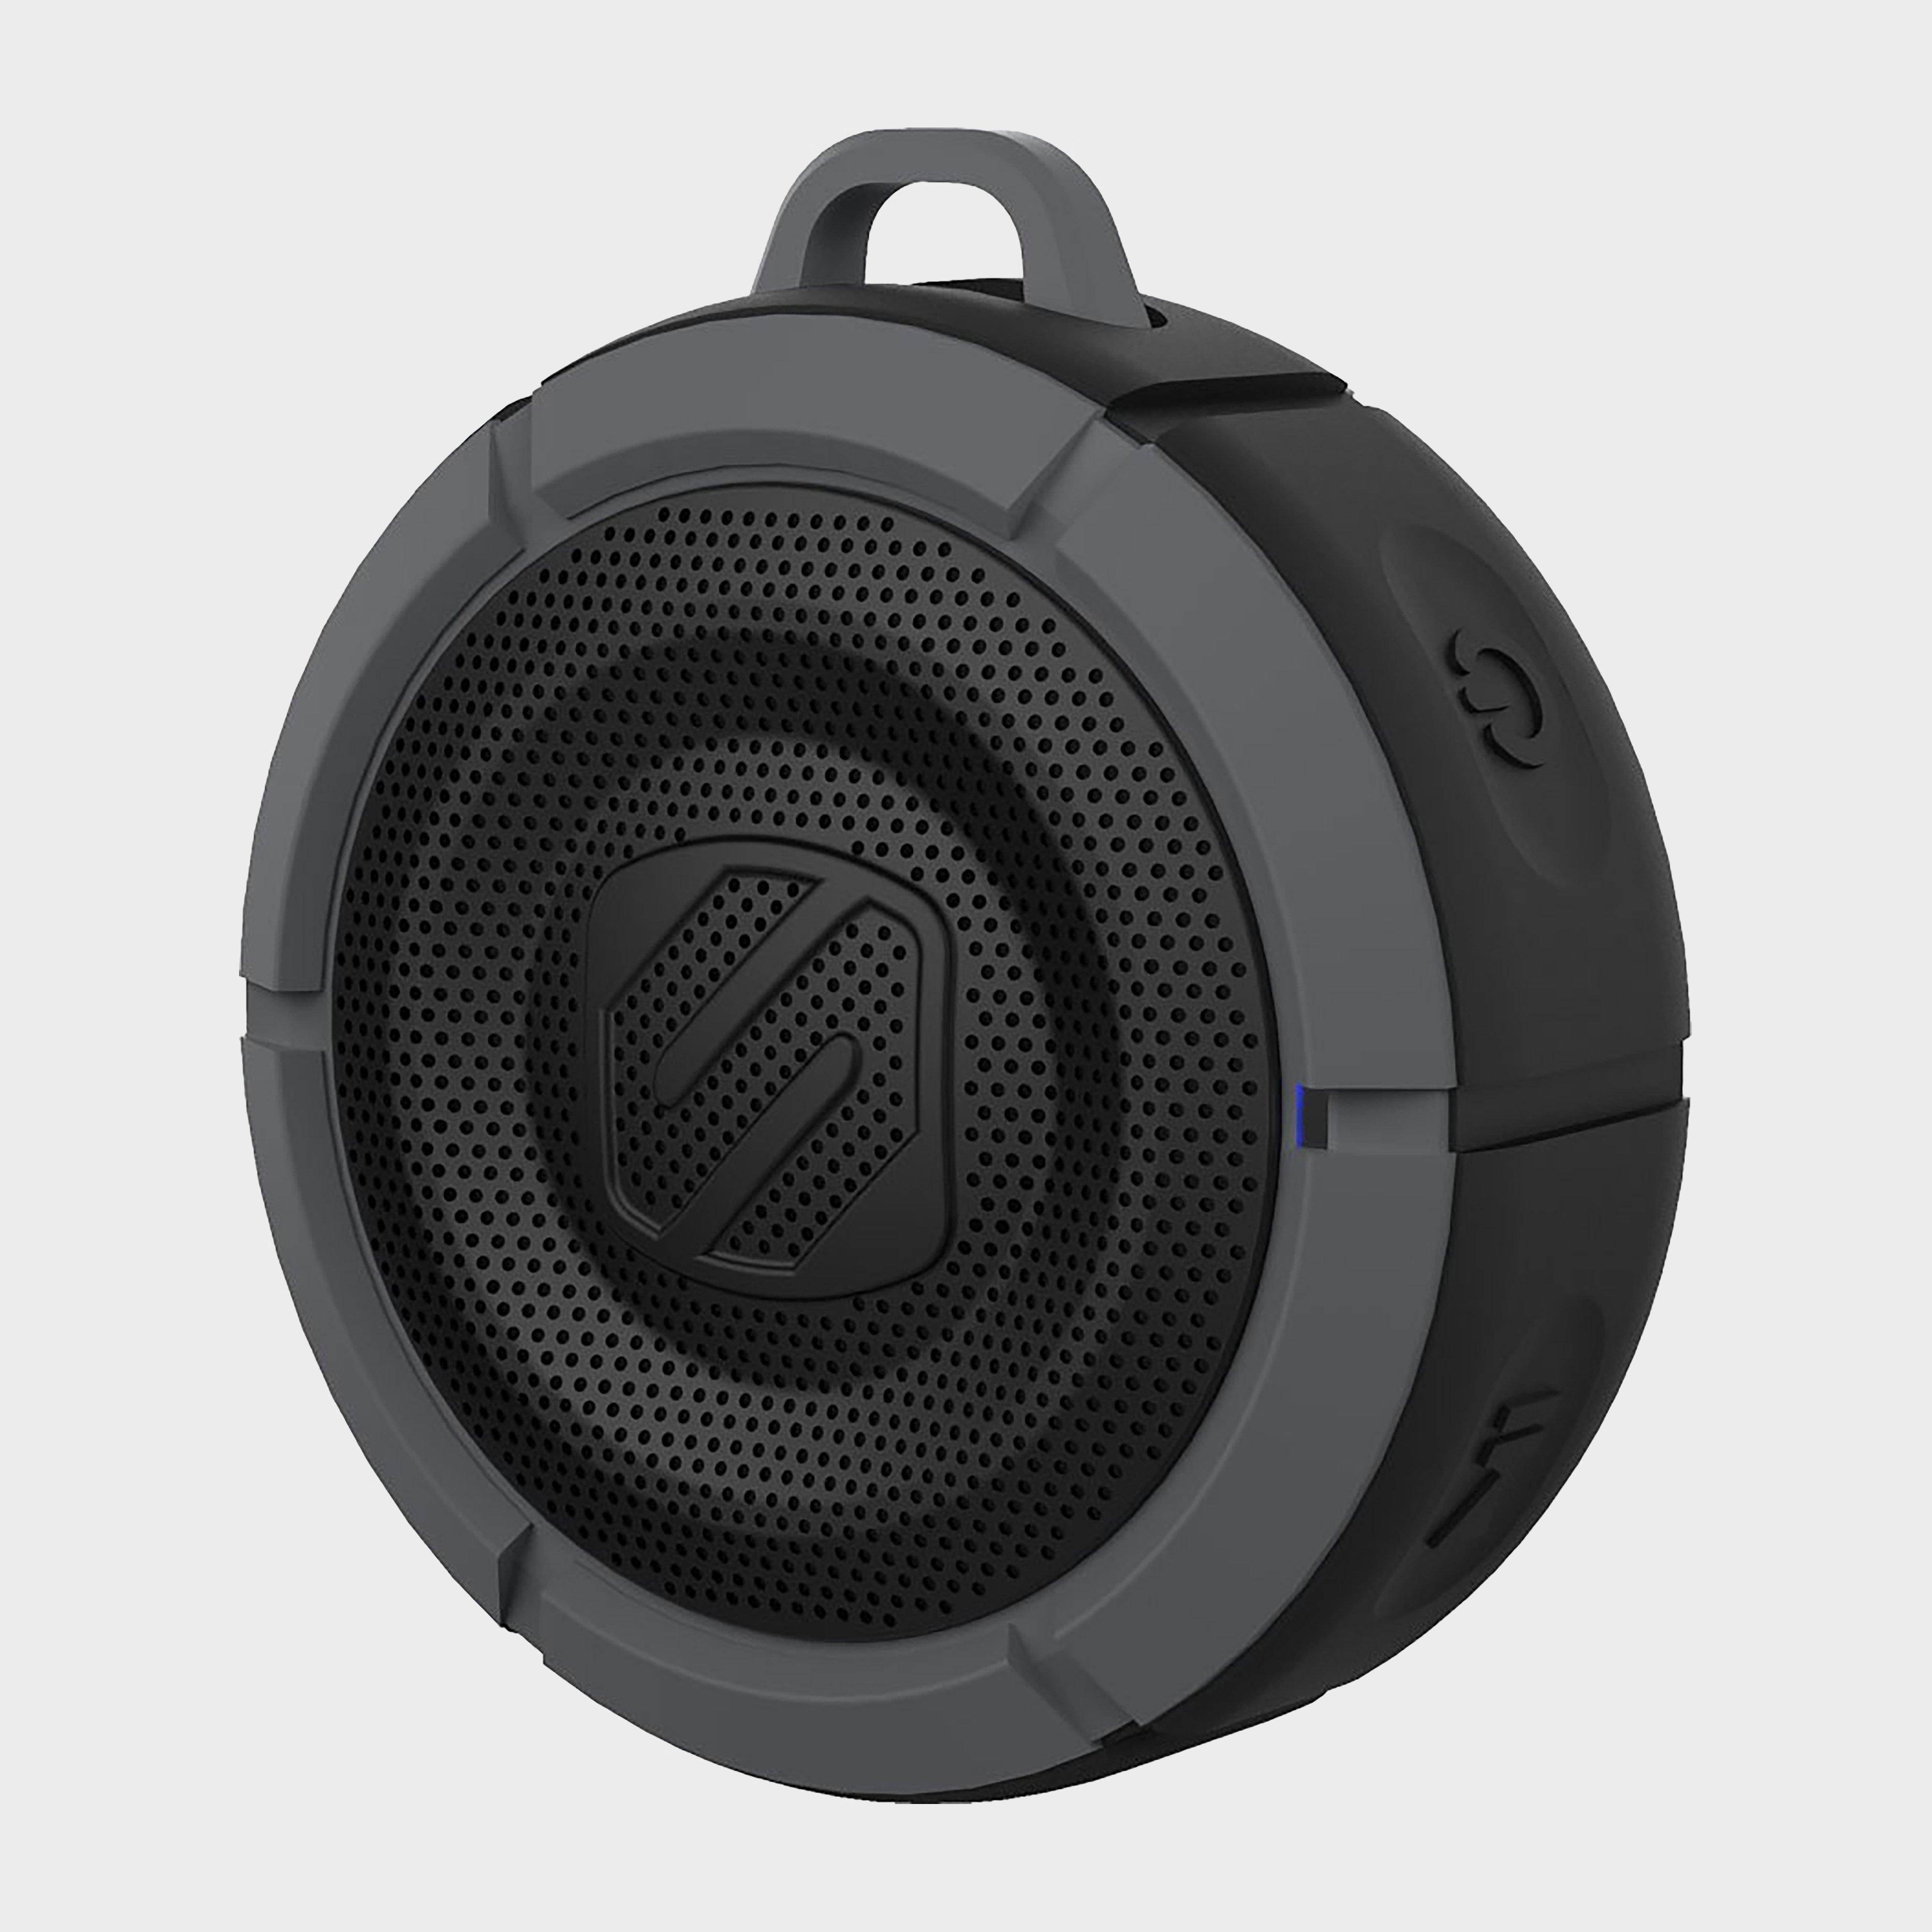 Scosche boomBUOY Speaker, Grey/SPEAKER